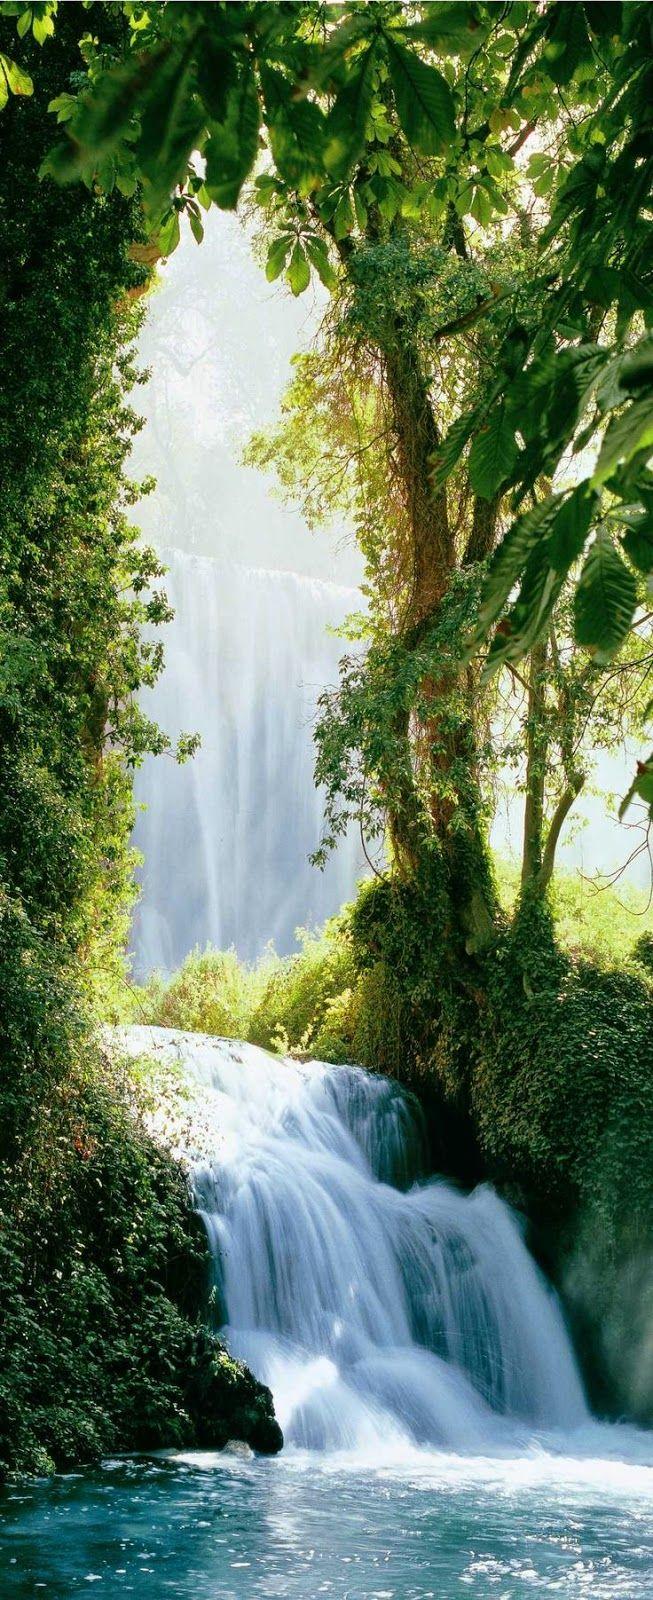 This Is Exactly The Image I Have Of The Biblical Garden Of Eden Aragon Landscape Waterfall Fotografia Da Natureza Fotografia De Paisagem Ideias De Paisagismo